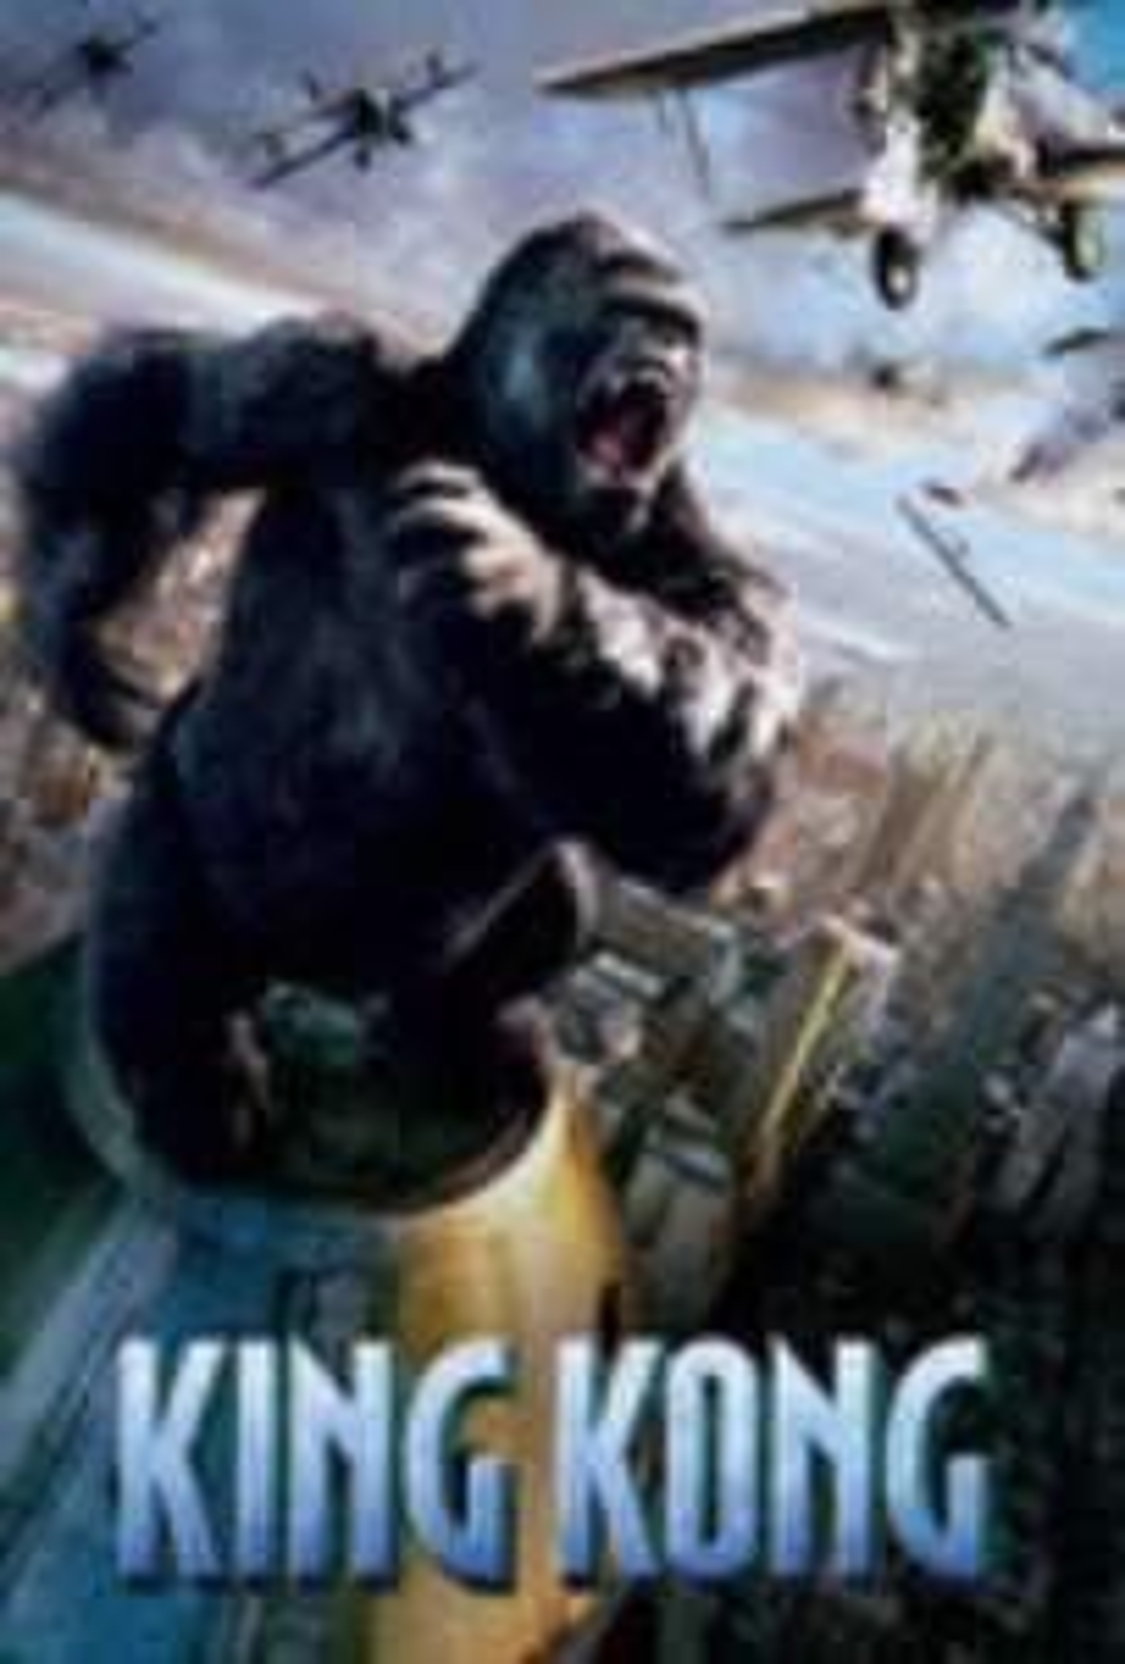 iTunes King Kong 4K zum Kauf